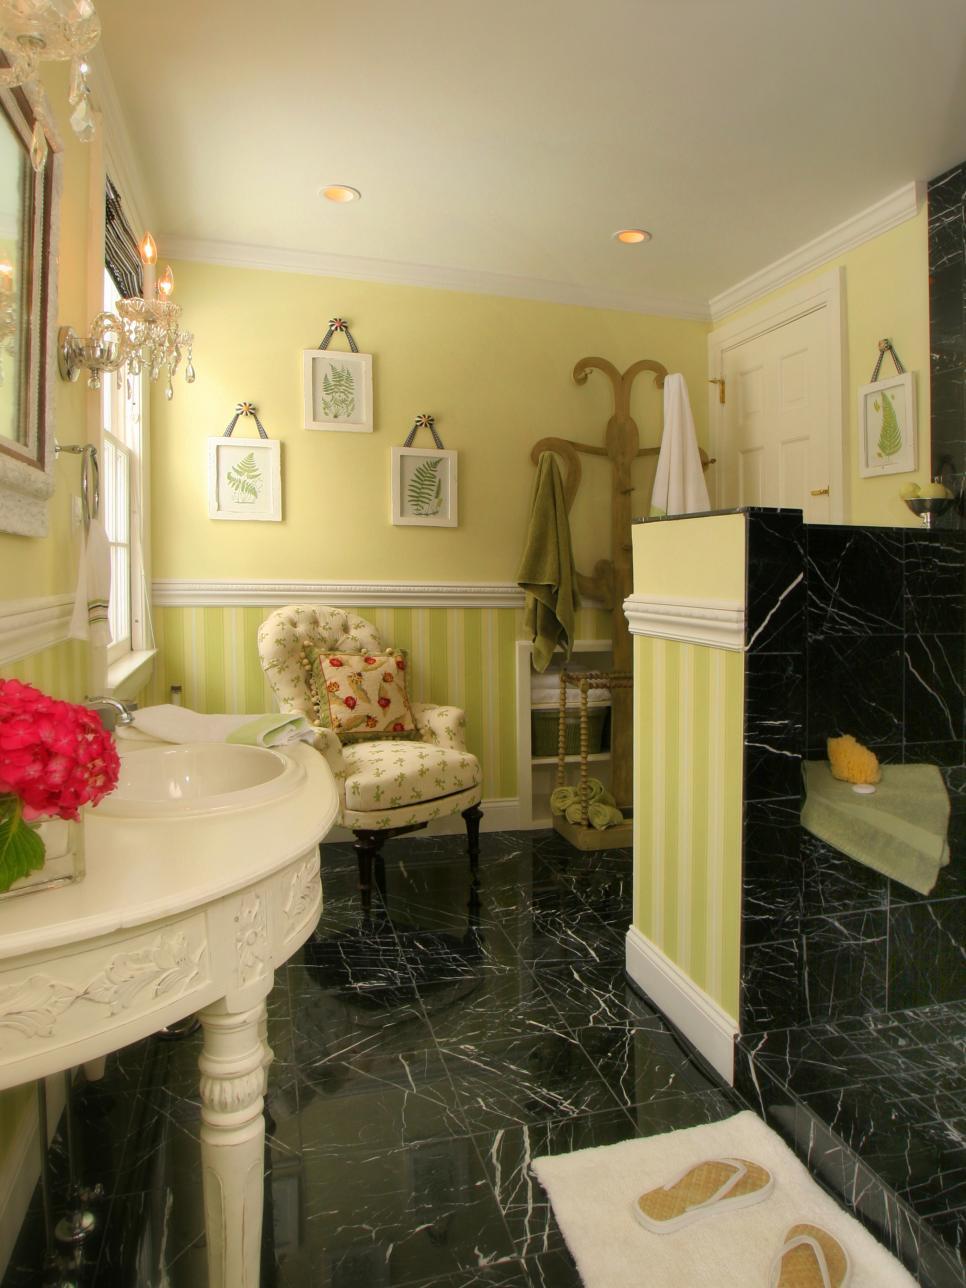 15 beautiful bathroom color ideas for Green and black bathroom ideas